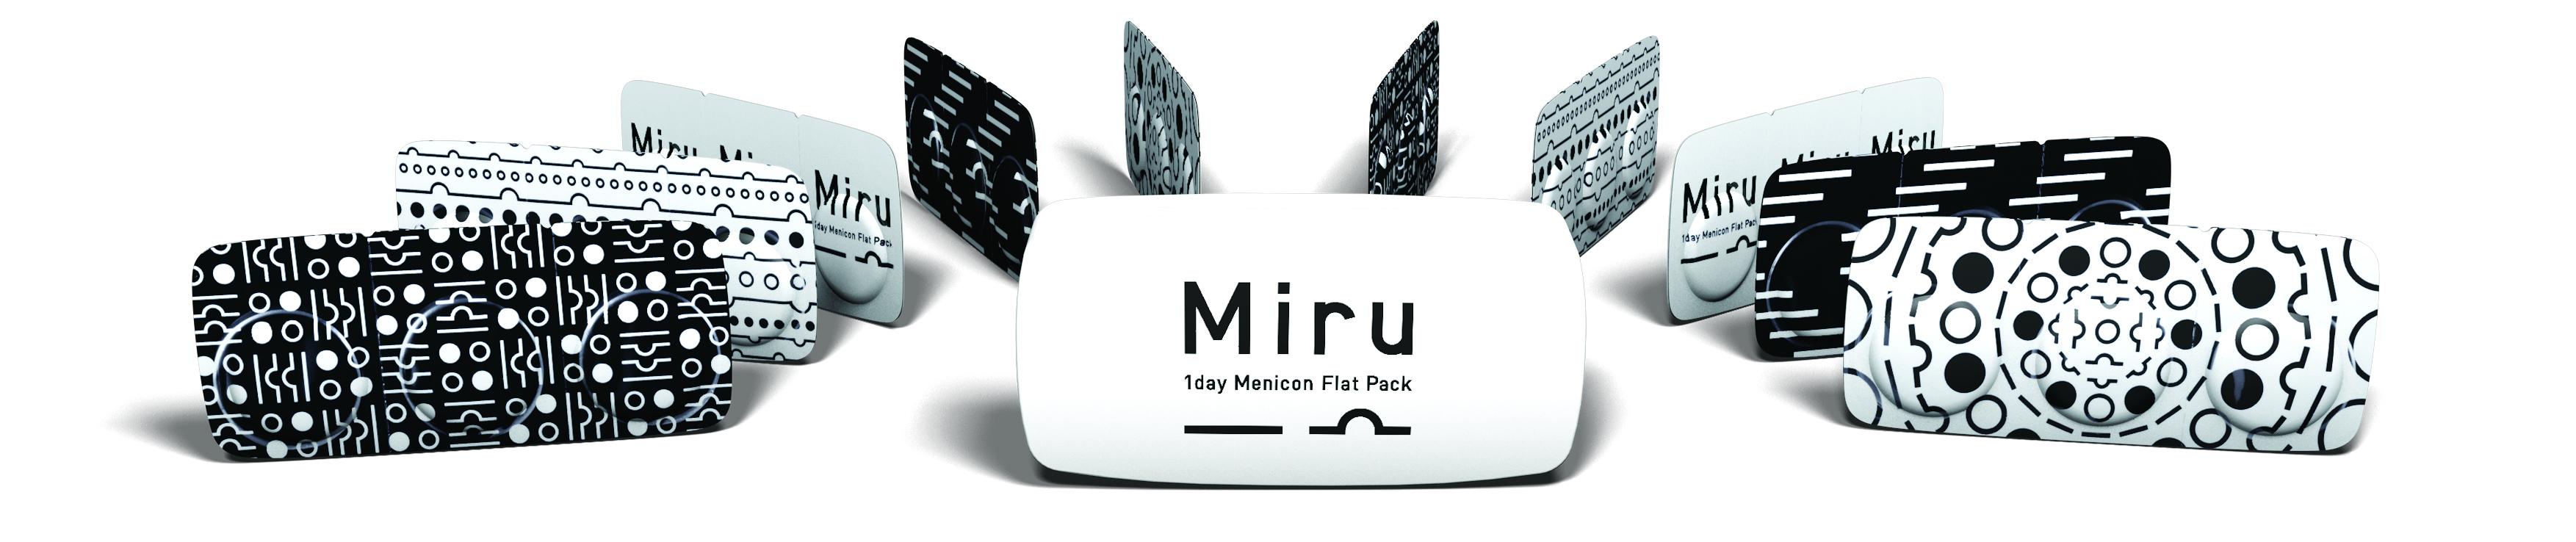 Front Miru 1 Day Flatpack